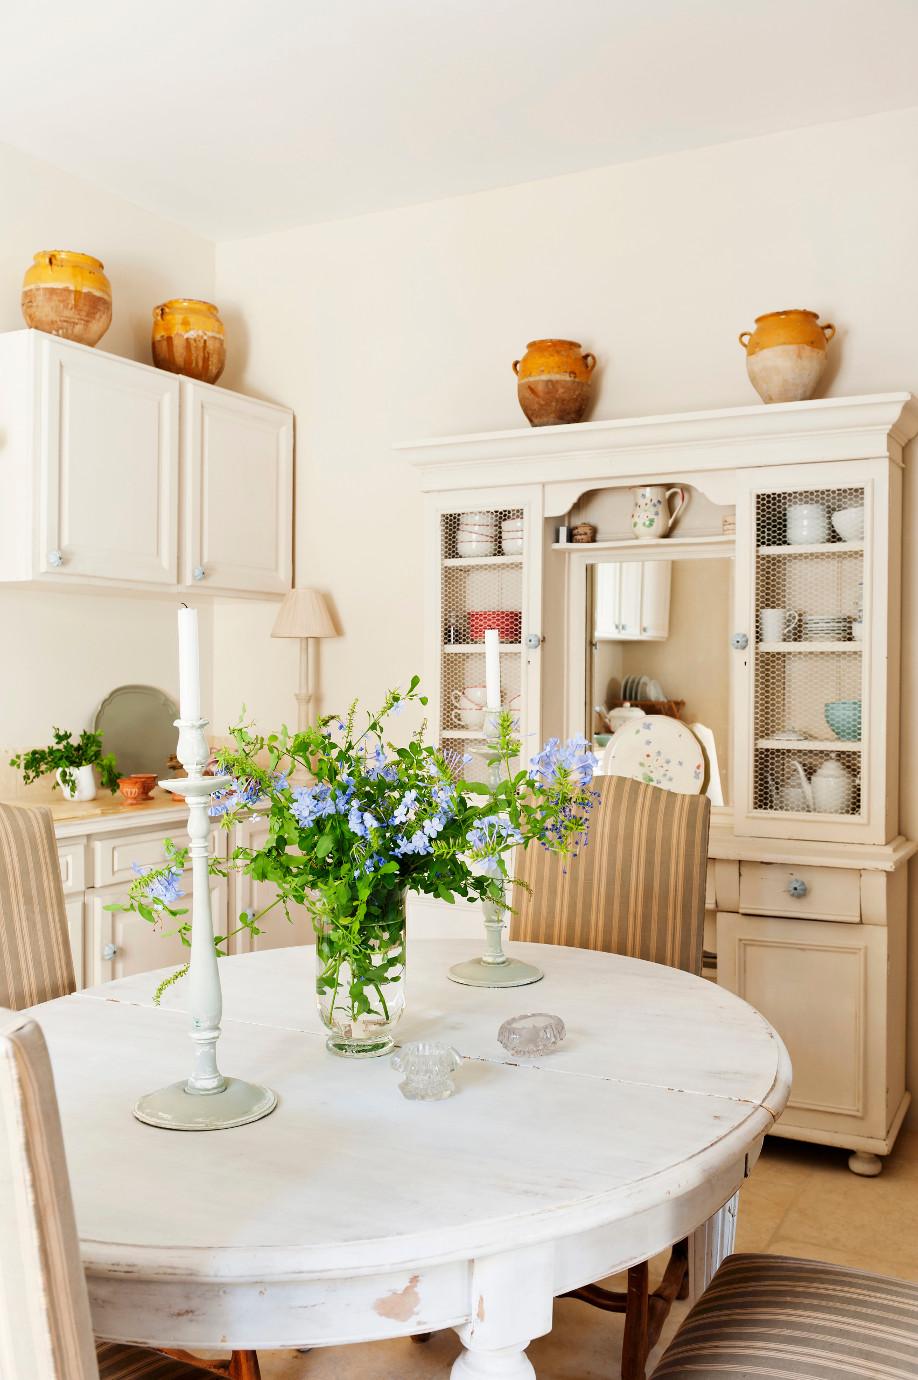 westwing-provence-stil-küche